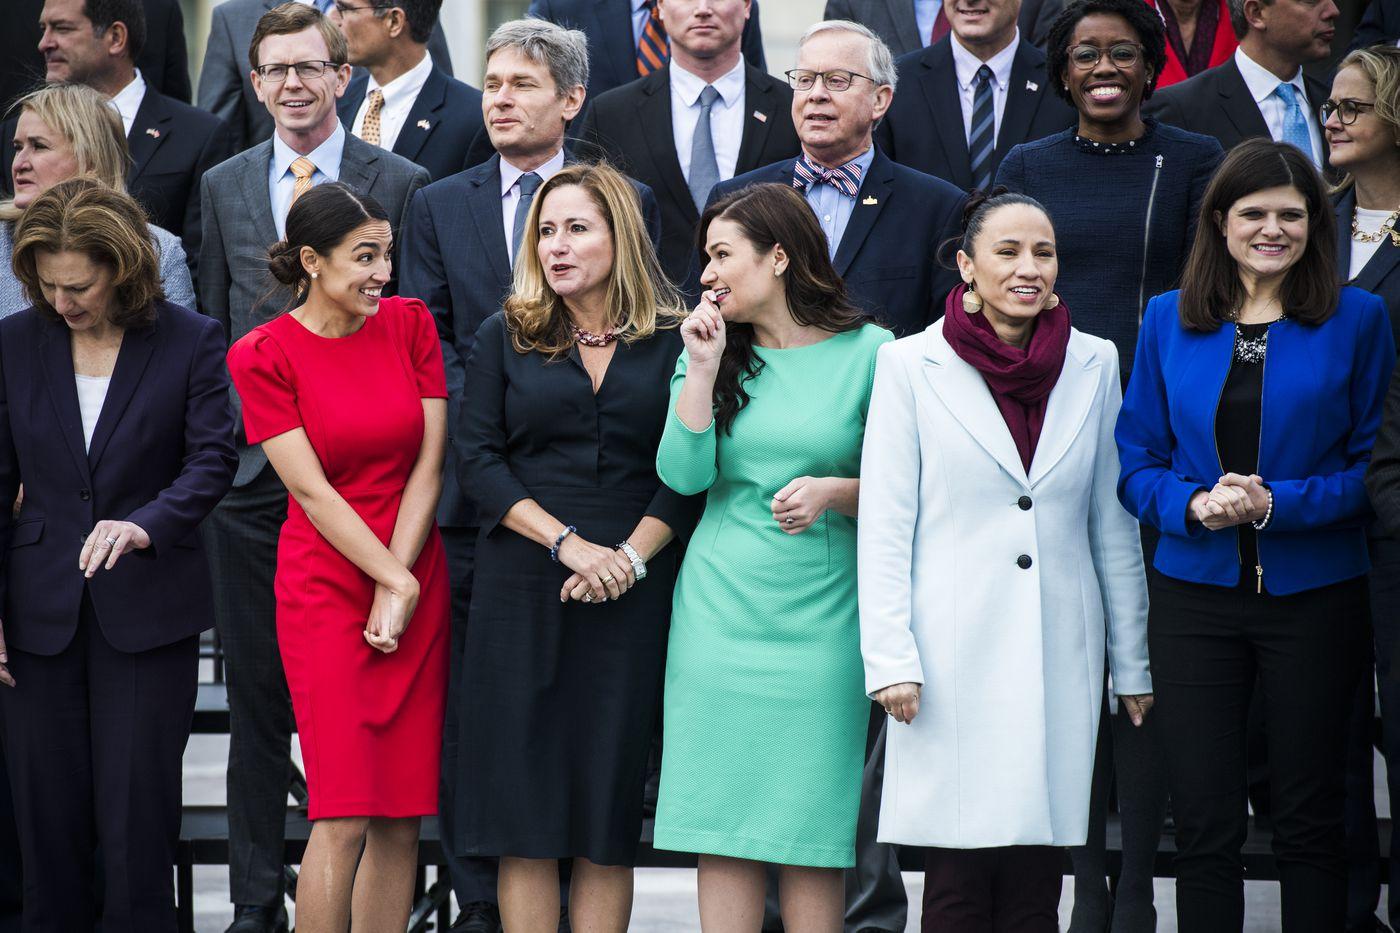 Not just Ocasio-Cortez: the fixation on women politicians